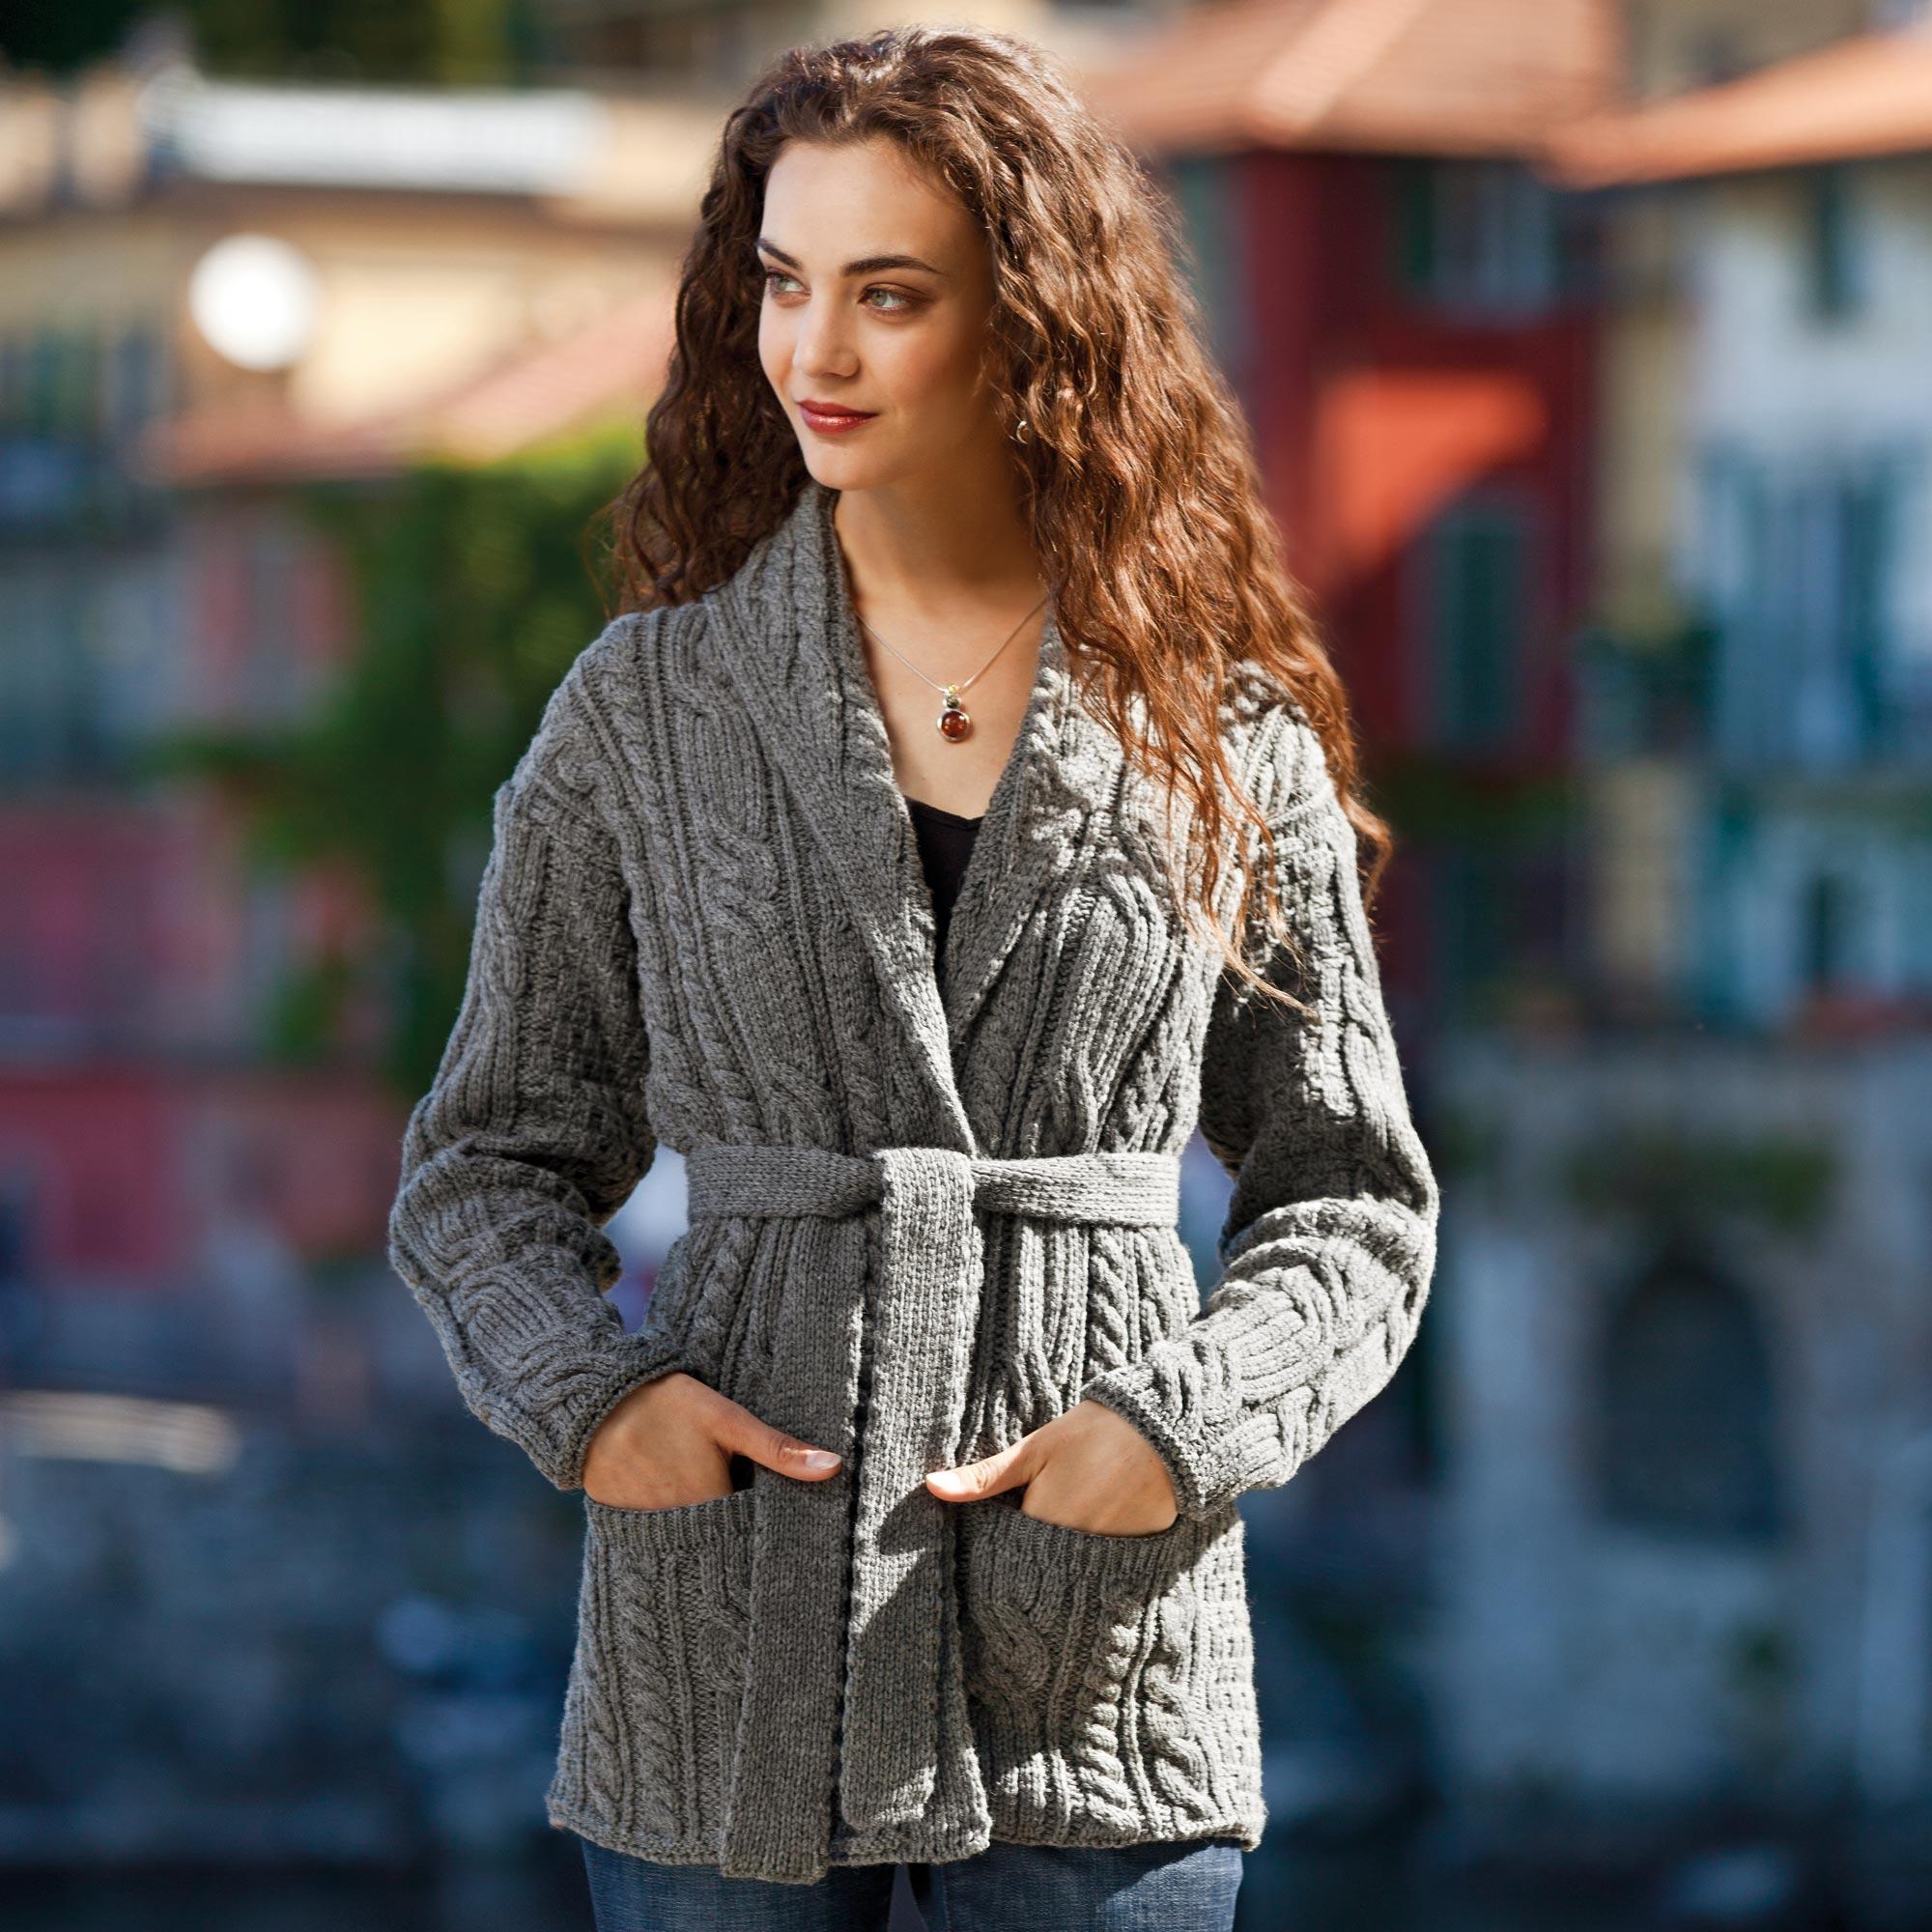 Felt Wool Sweater, dark grey sweater gray and green knit knitted Merino wool Long wool sweaters for woman bohemian cardigan